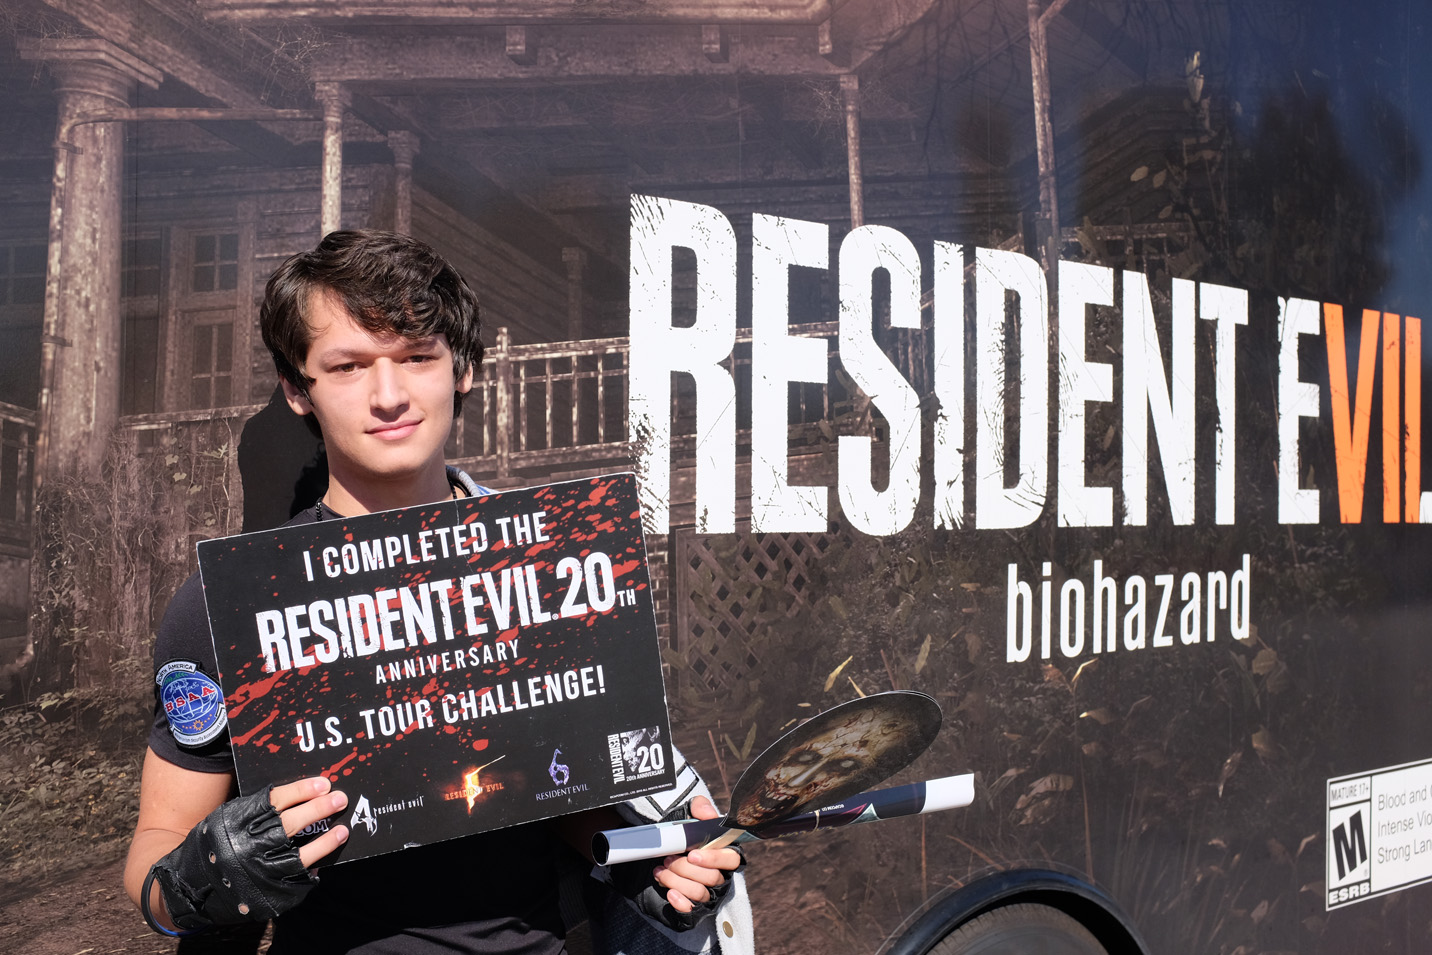 resident evil anniversary tour challenge